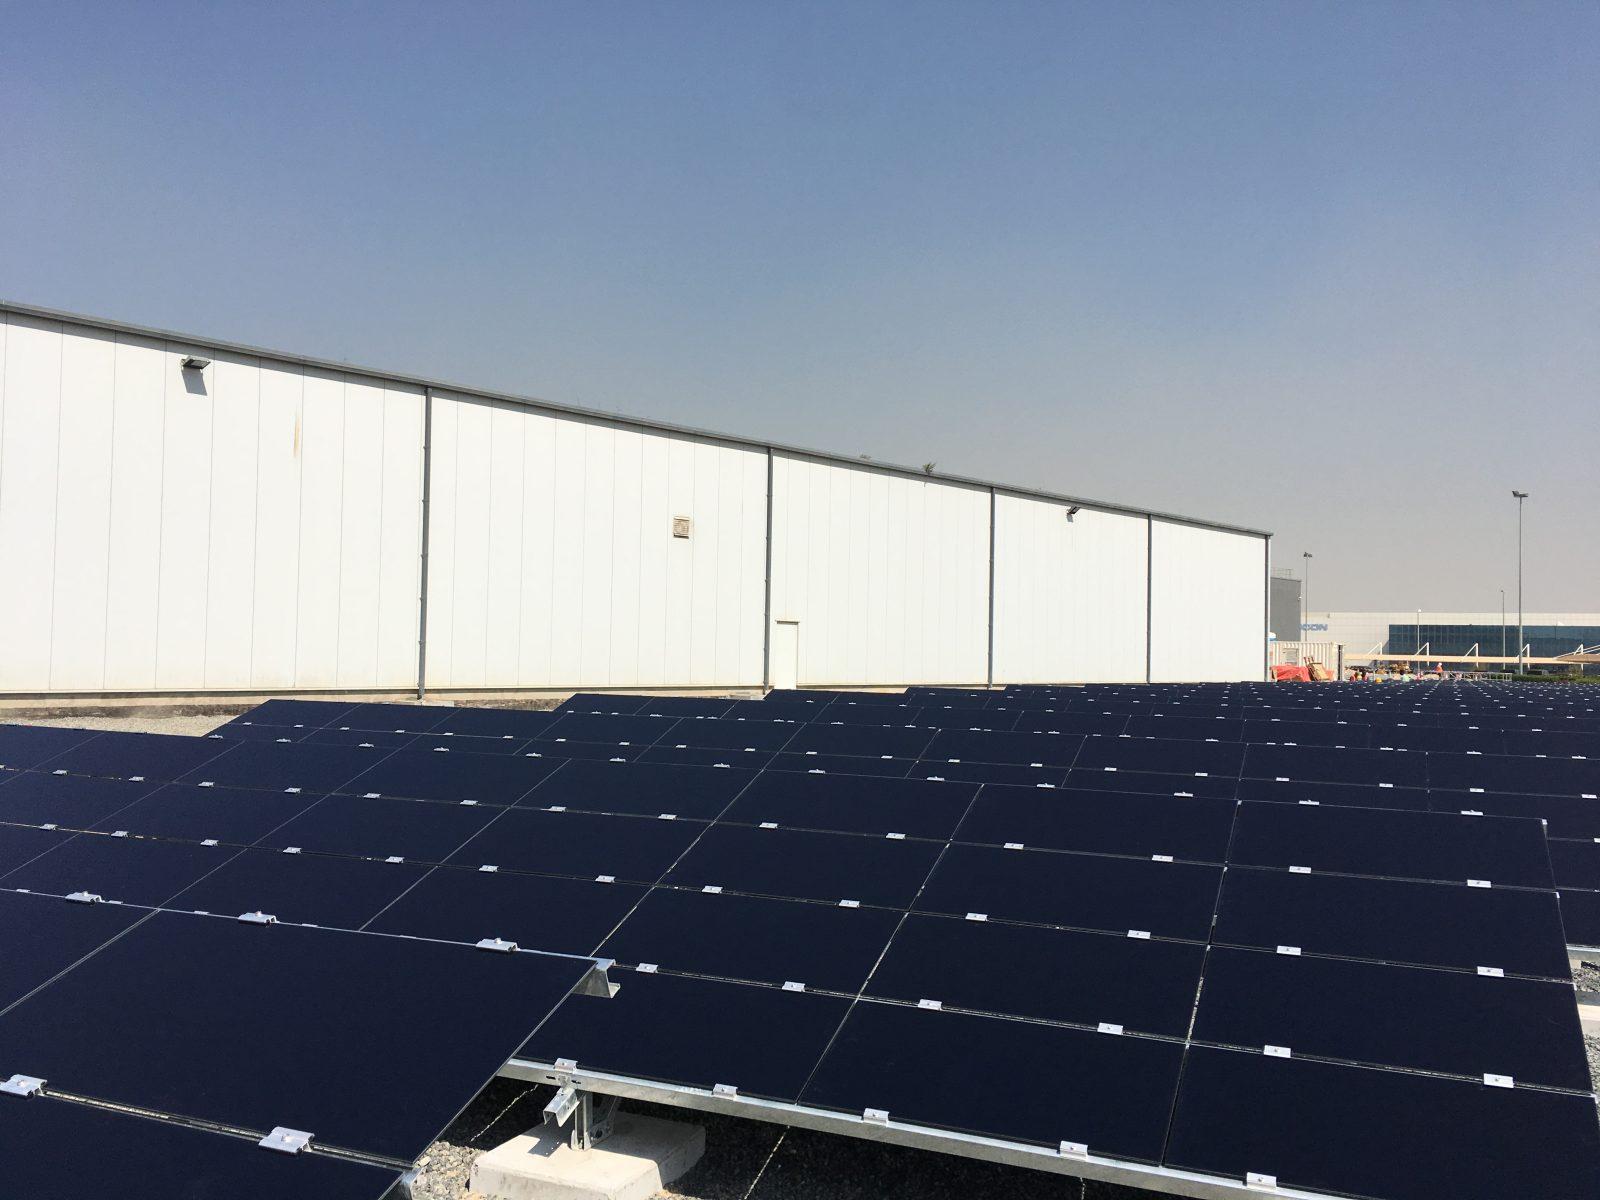 HARNESSING SOLAR ENERGY - Mohamed Abdulrahman Al-Bahar